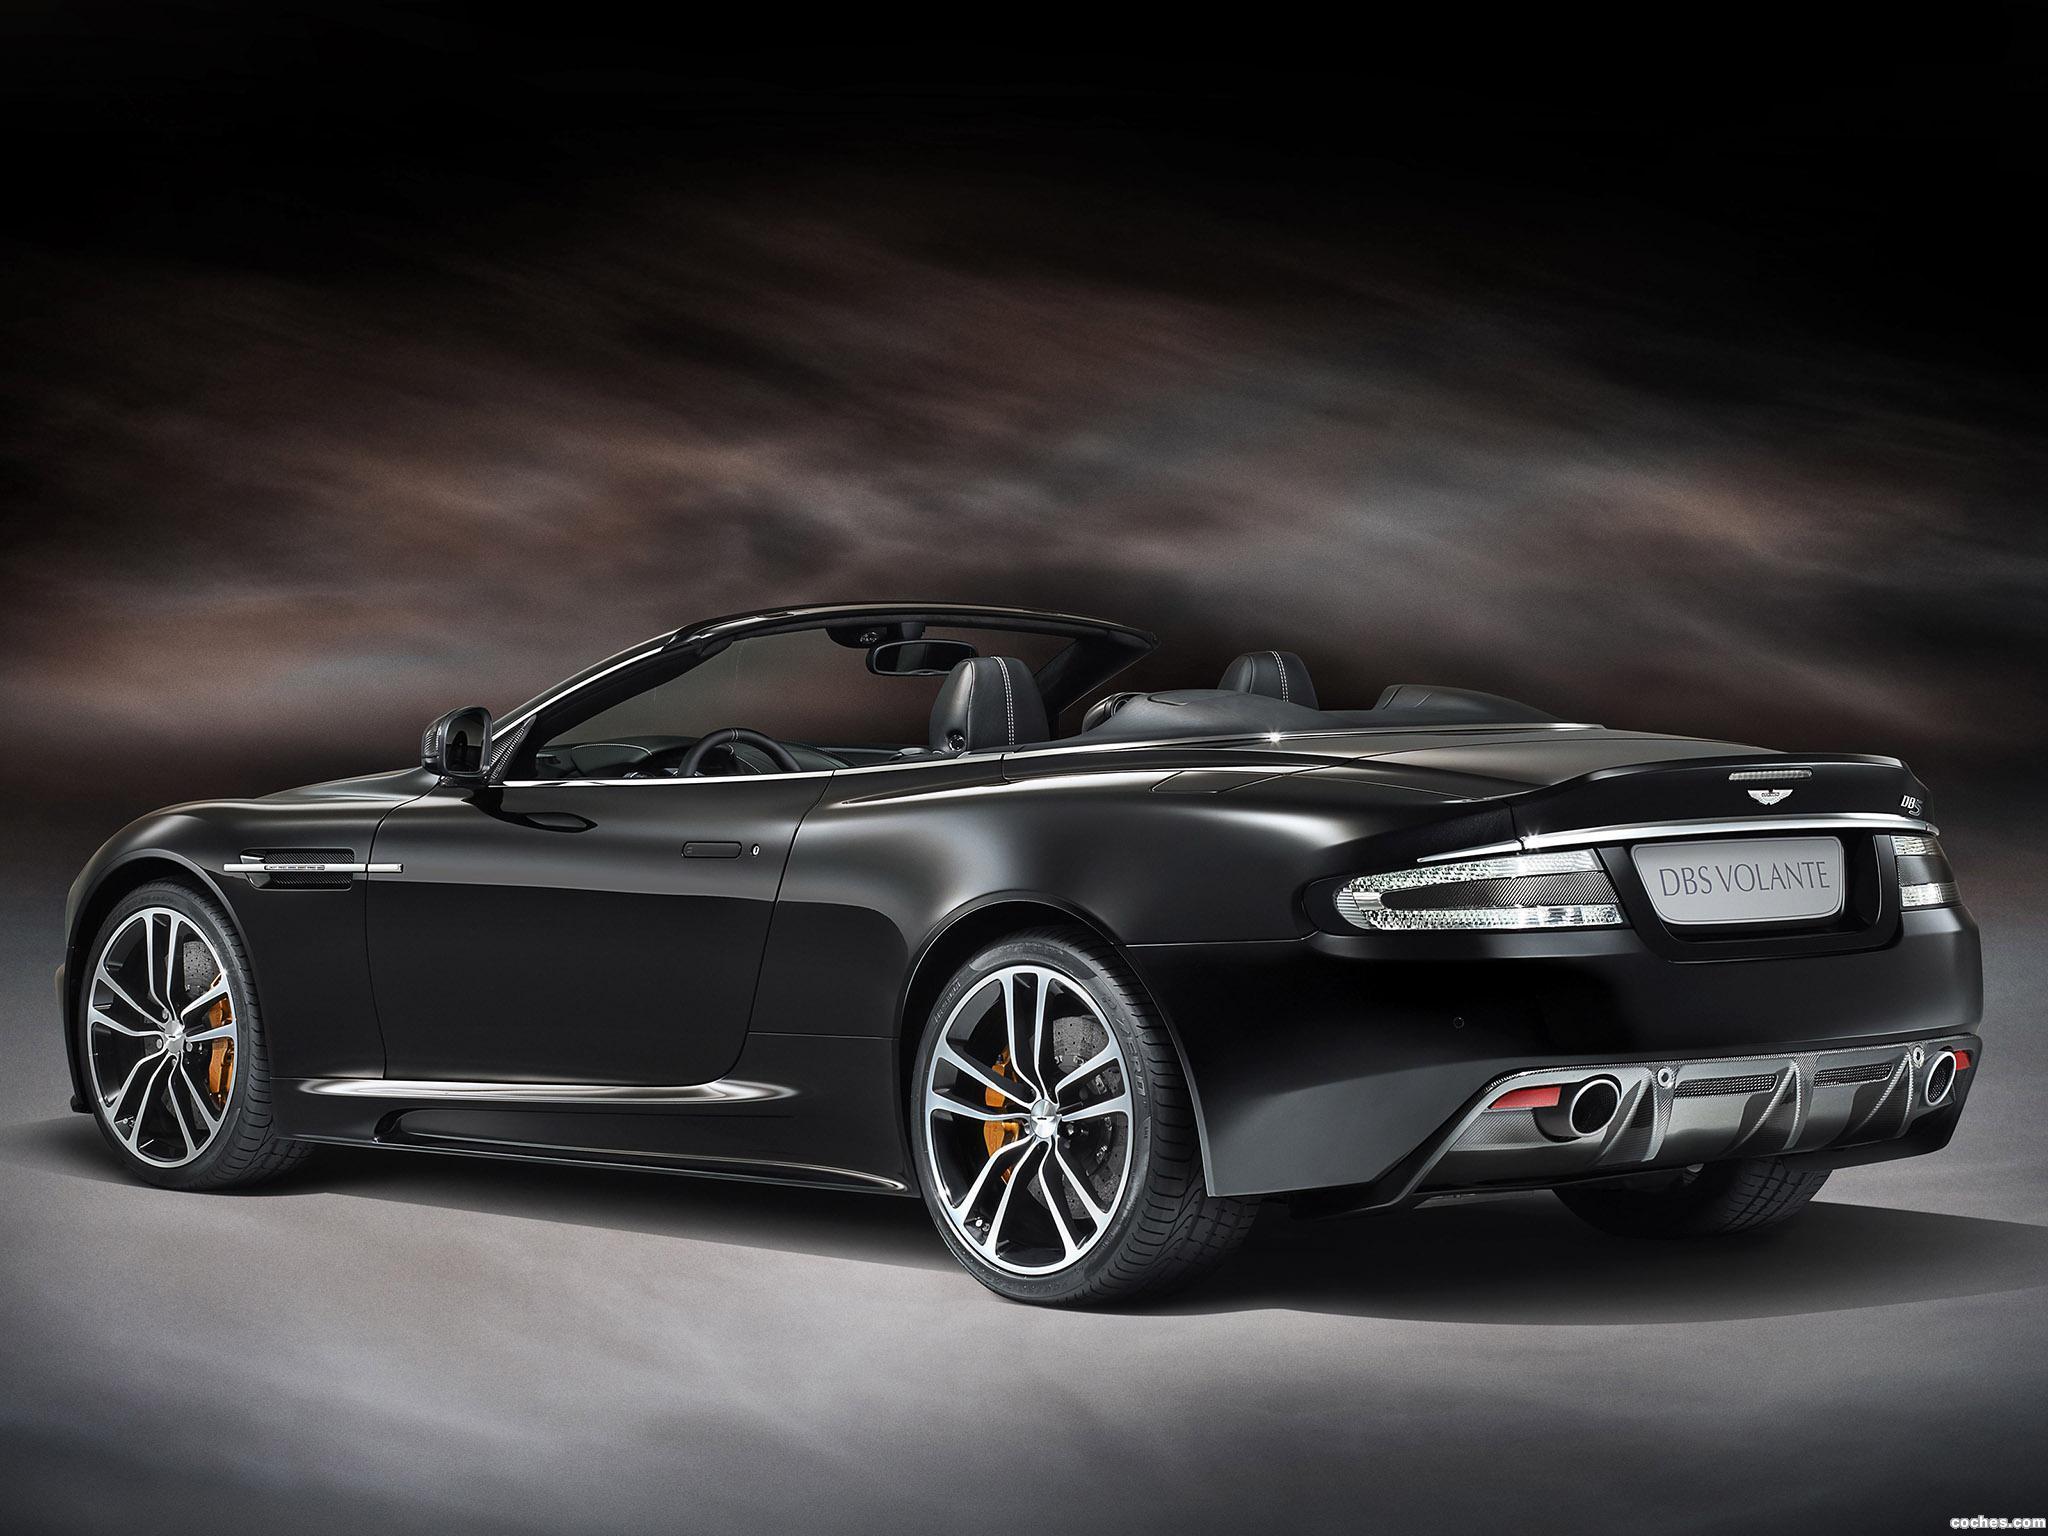 Foto 0 de Aston Martin DBS Volante Carbon Edition 2012